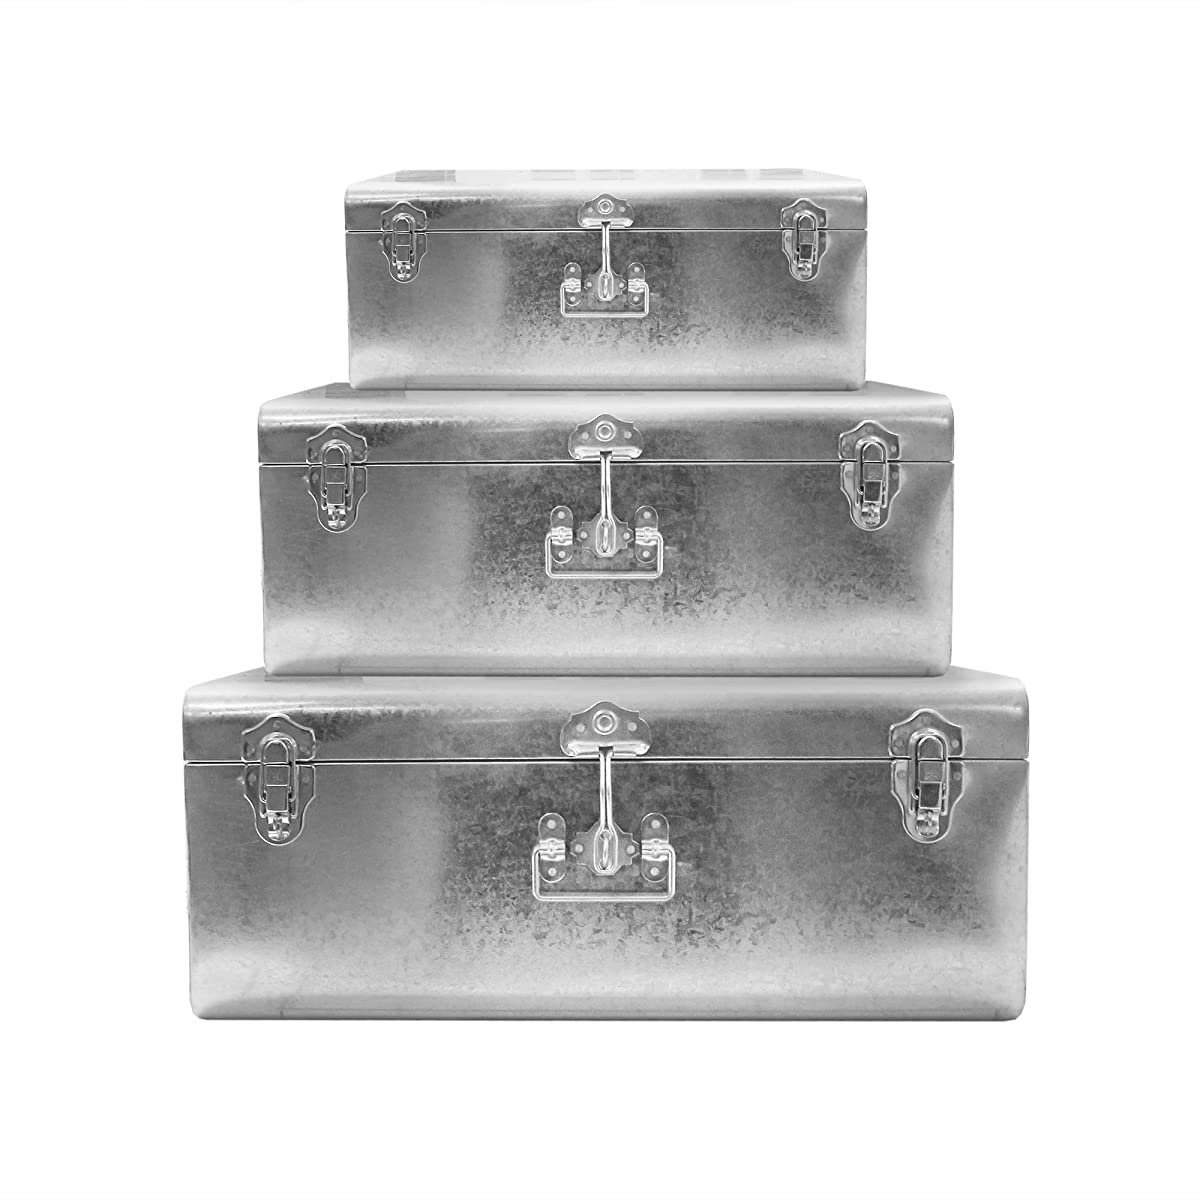 Zanzer Silver Galvanized Metal Trunks Set of 3 - Vintage Style Storage w/Silver Finish Handles & Locks - Space Saving Organizer Home Dorm & Office Use